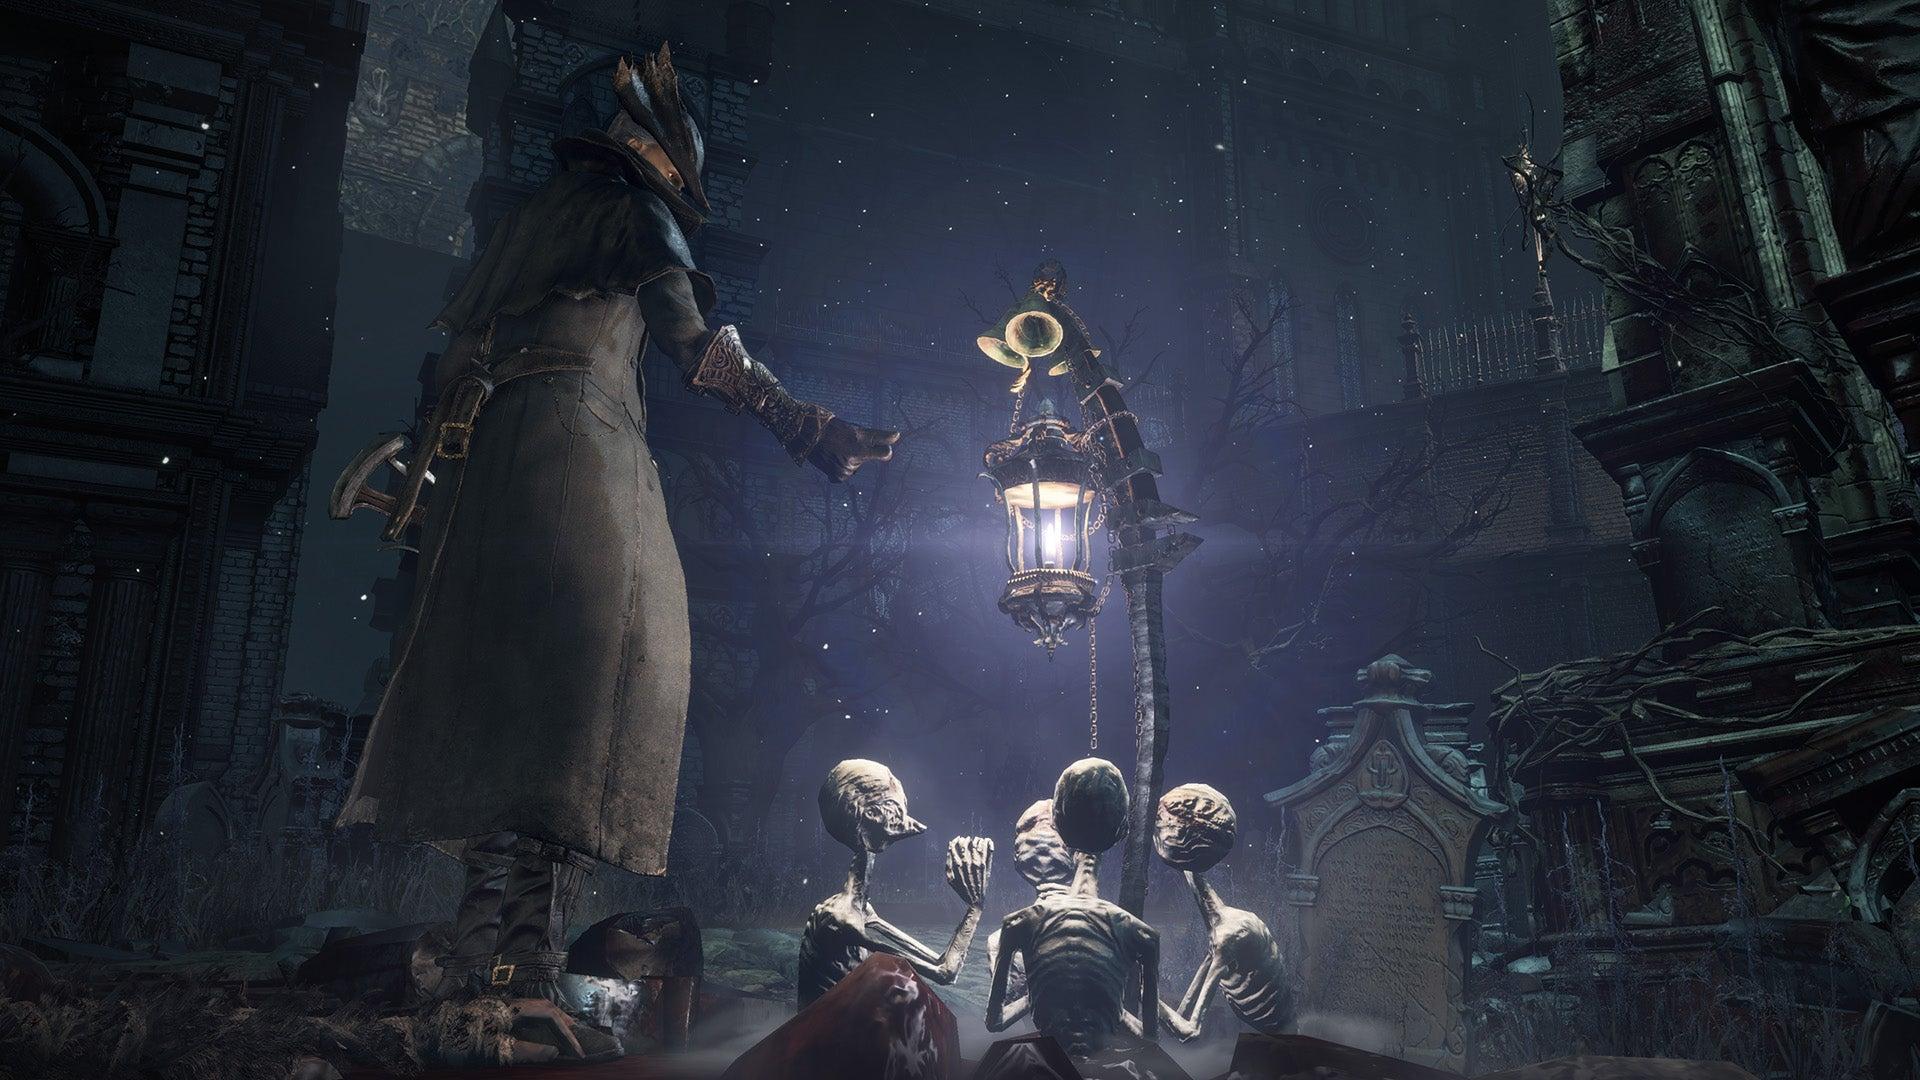 z71k5eq6ft9fnwmhtrxh - Dark Souls III and Bloodborne: A Comparison in Game Design